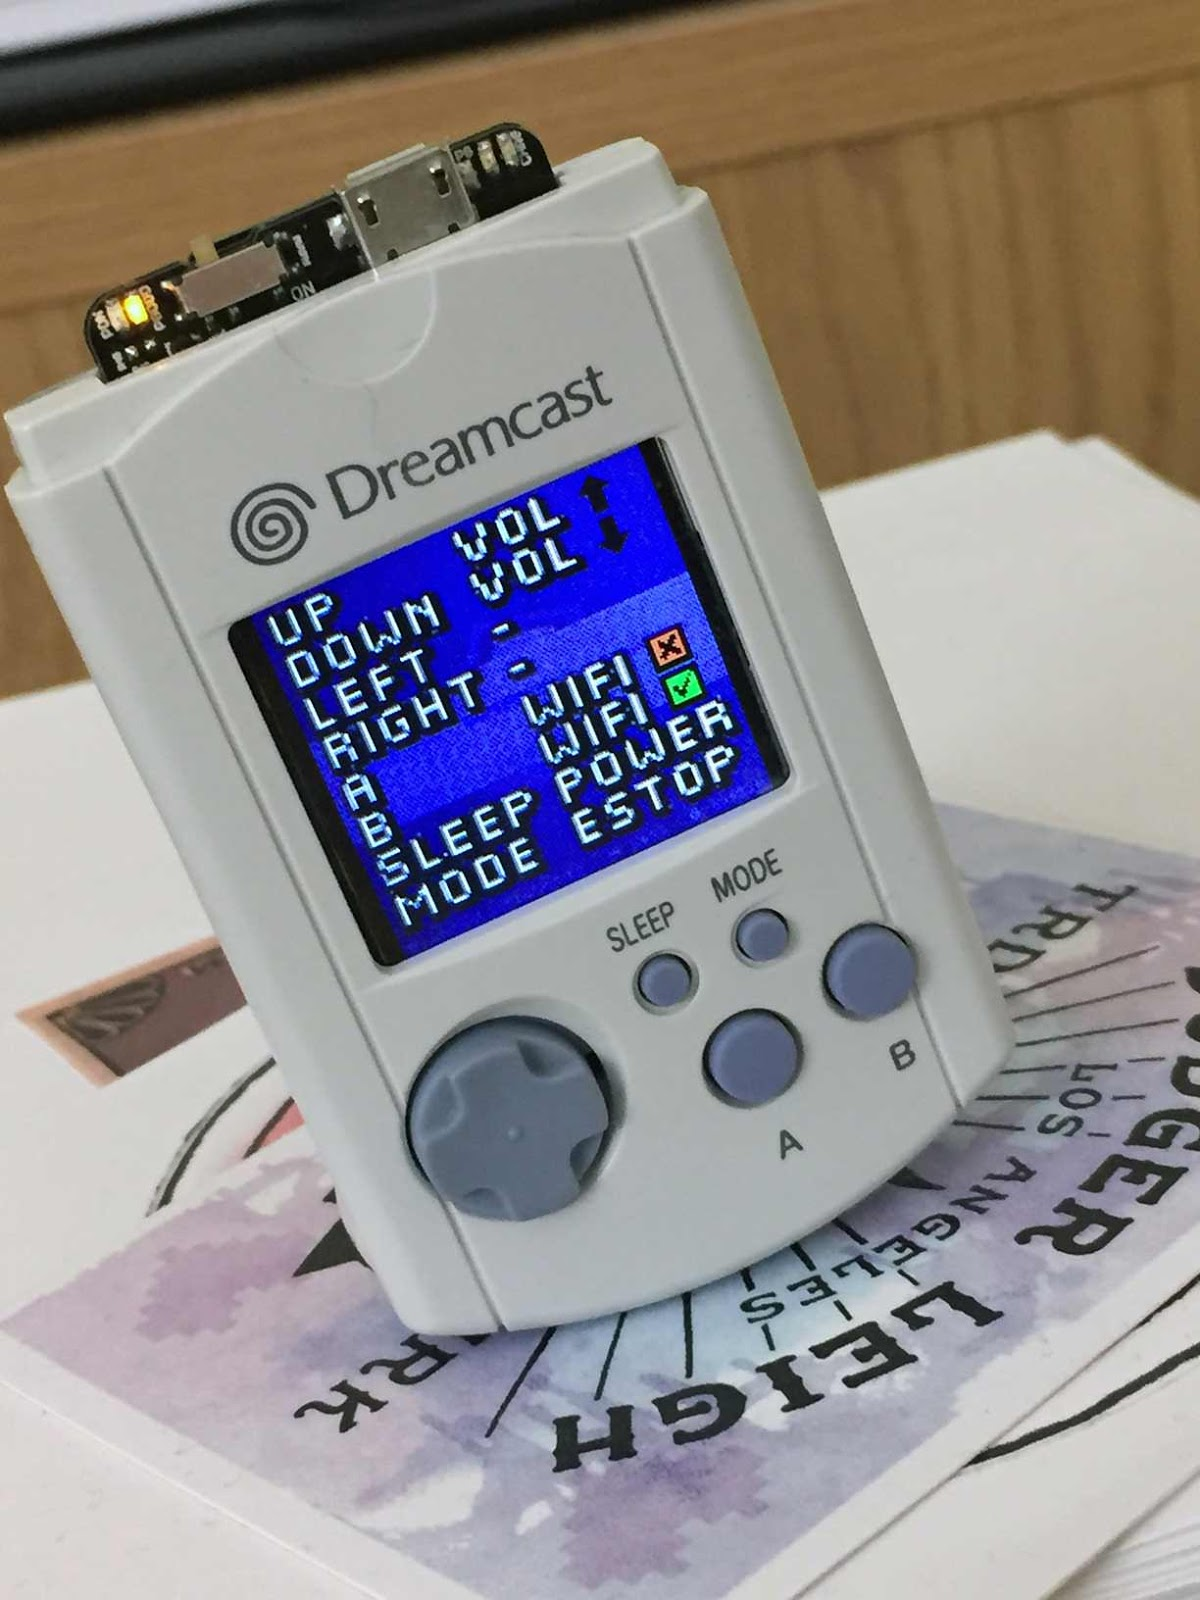 The Dreamcast Junkyard: Introducing VMU-boy - A RetroPie